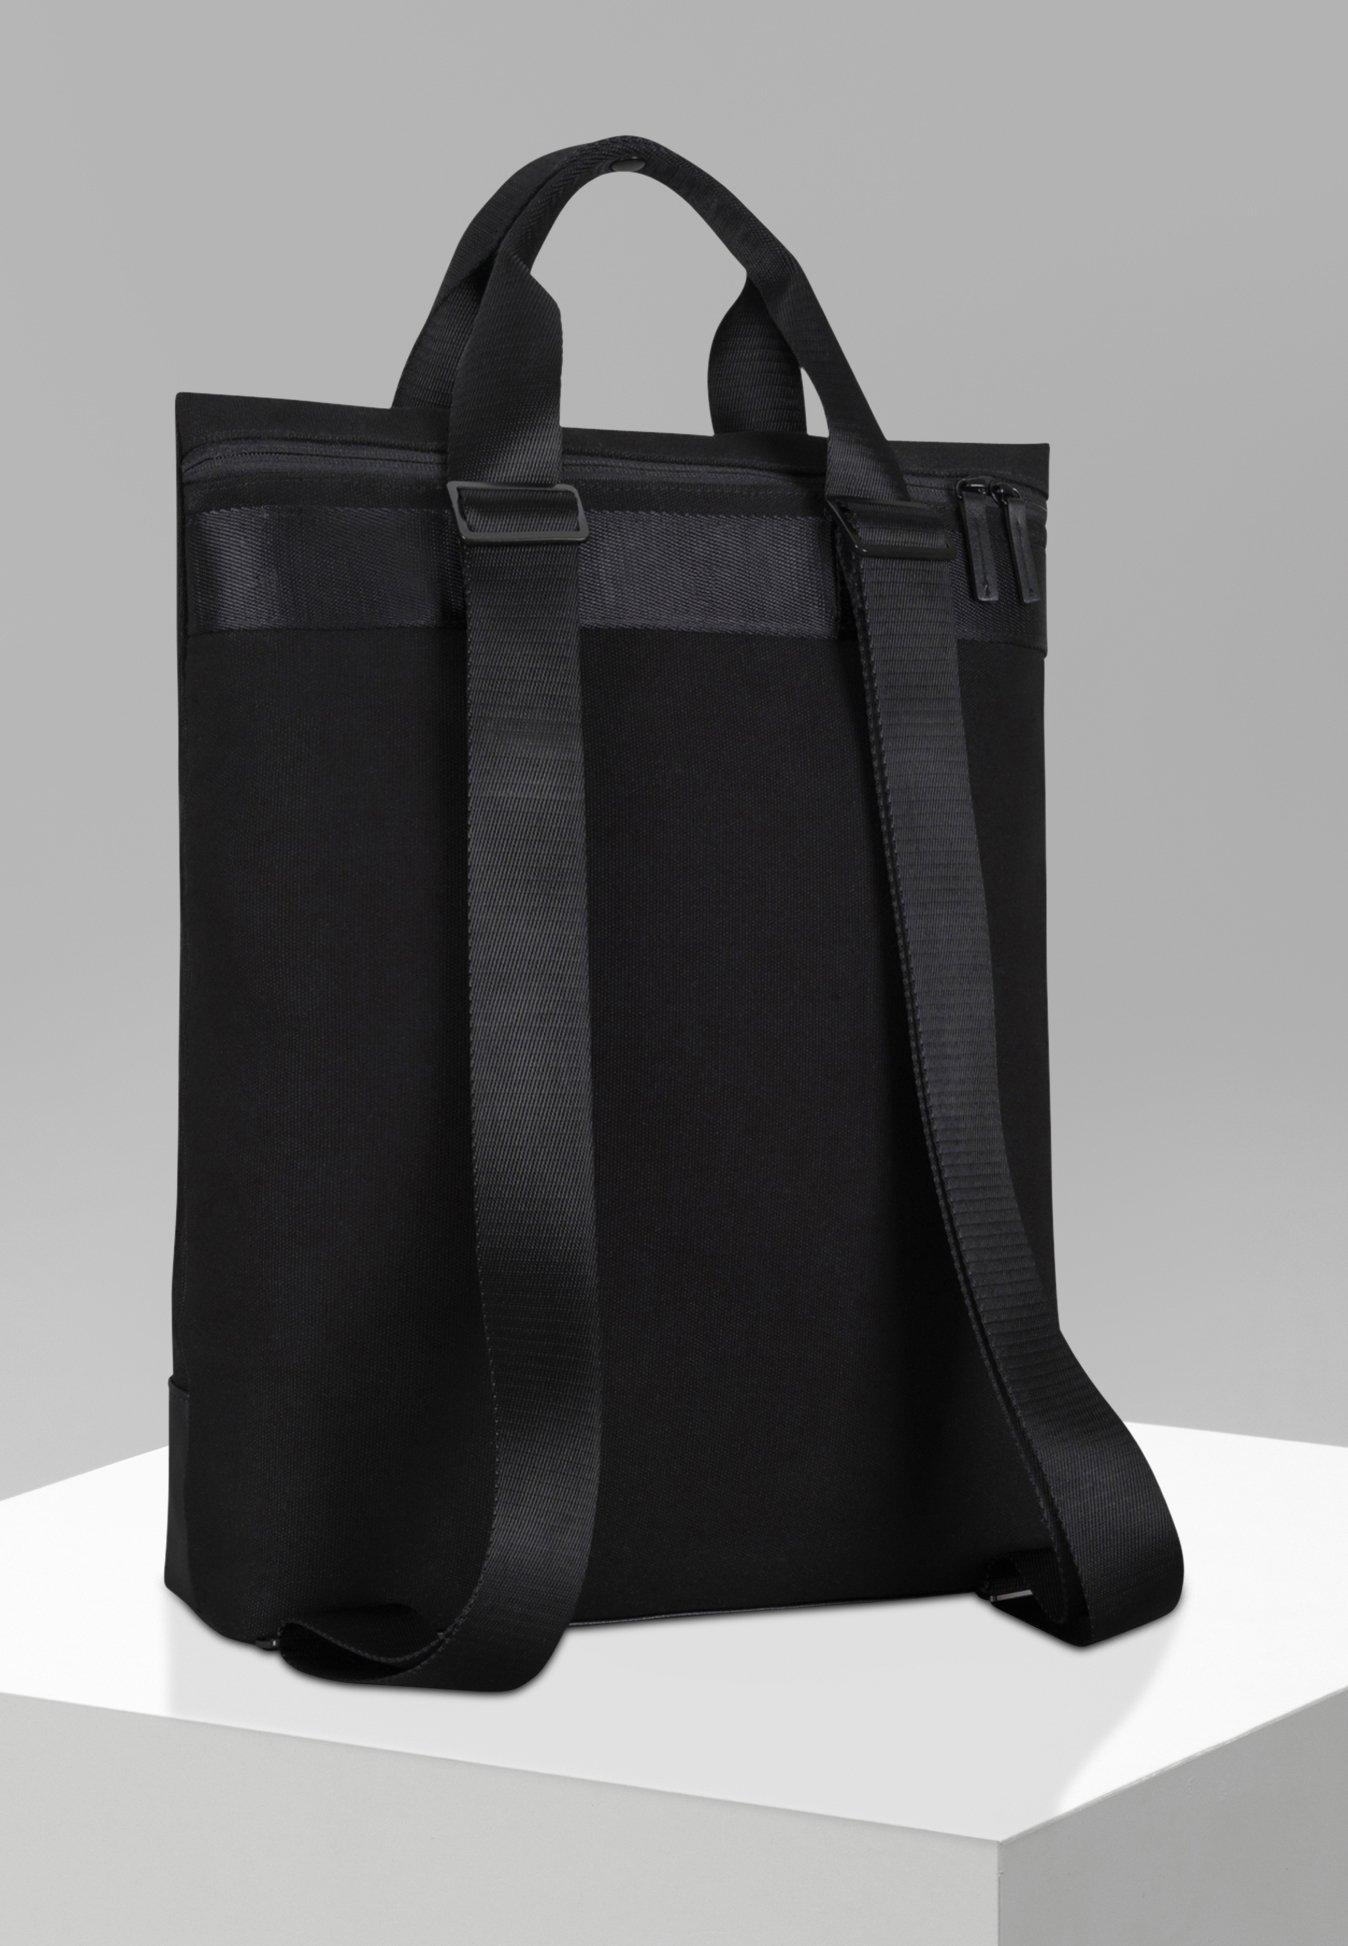 Johnny Urban Tagesrucksack - black/schwarz - Herrentaschen 4NgQC